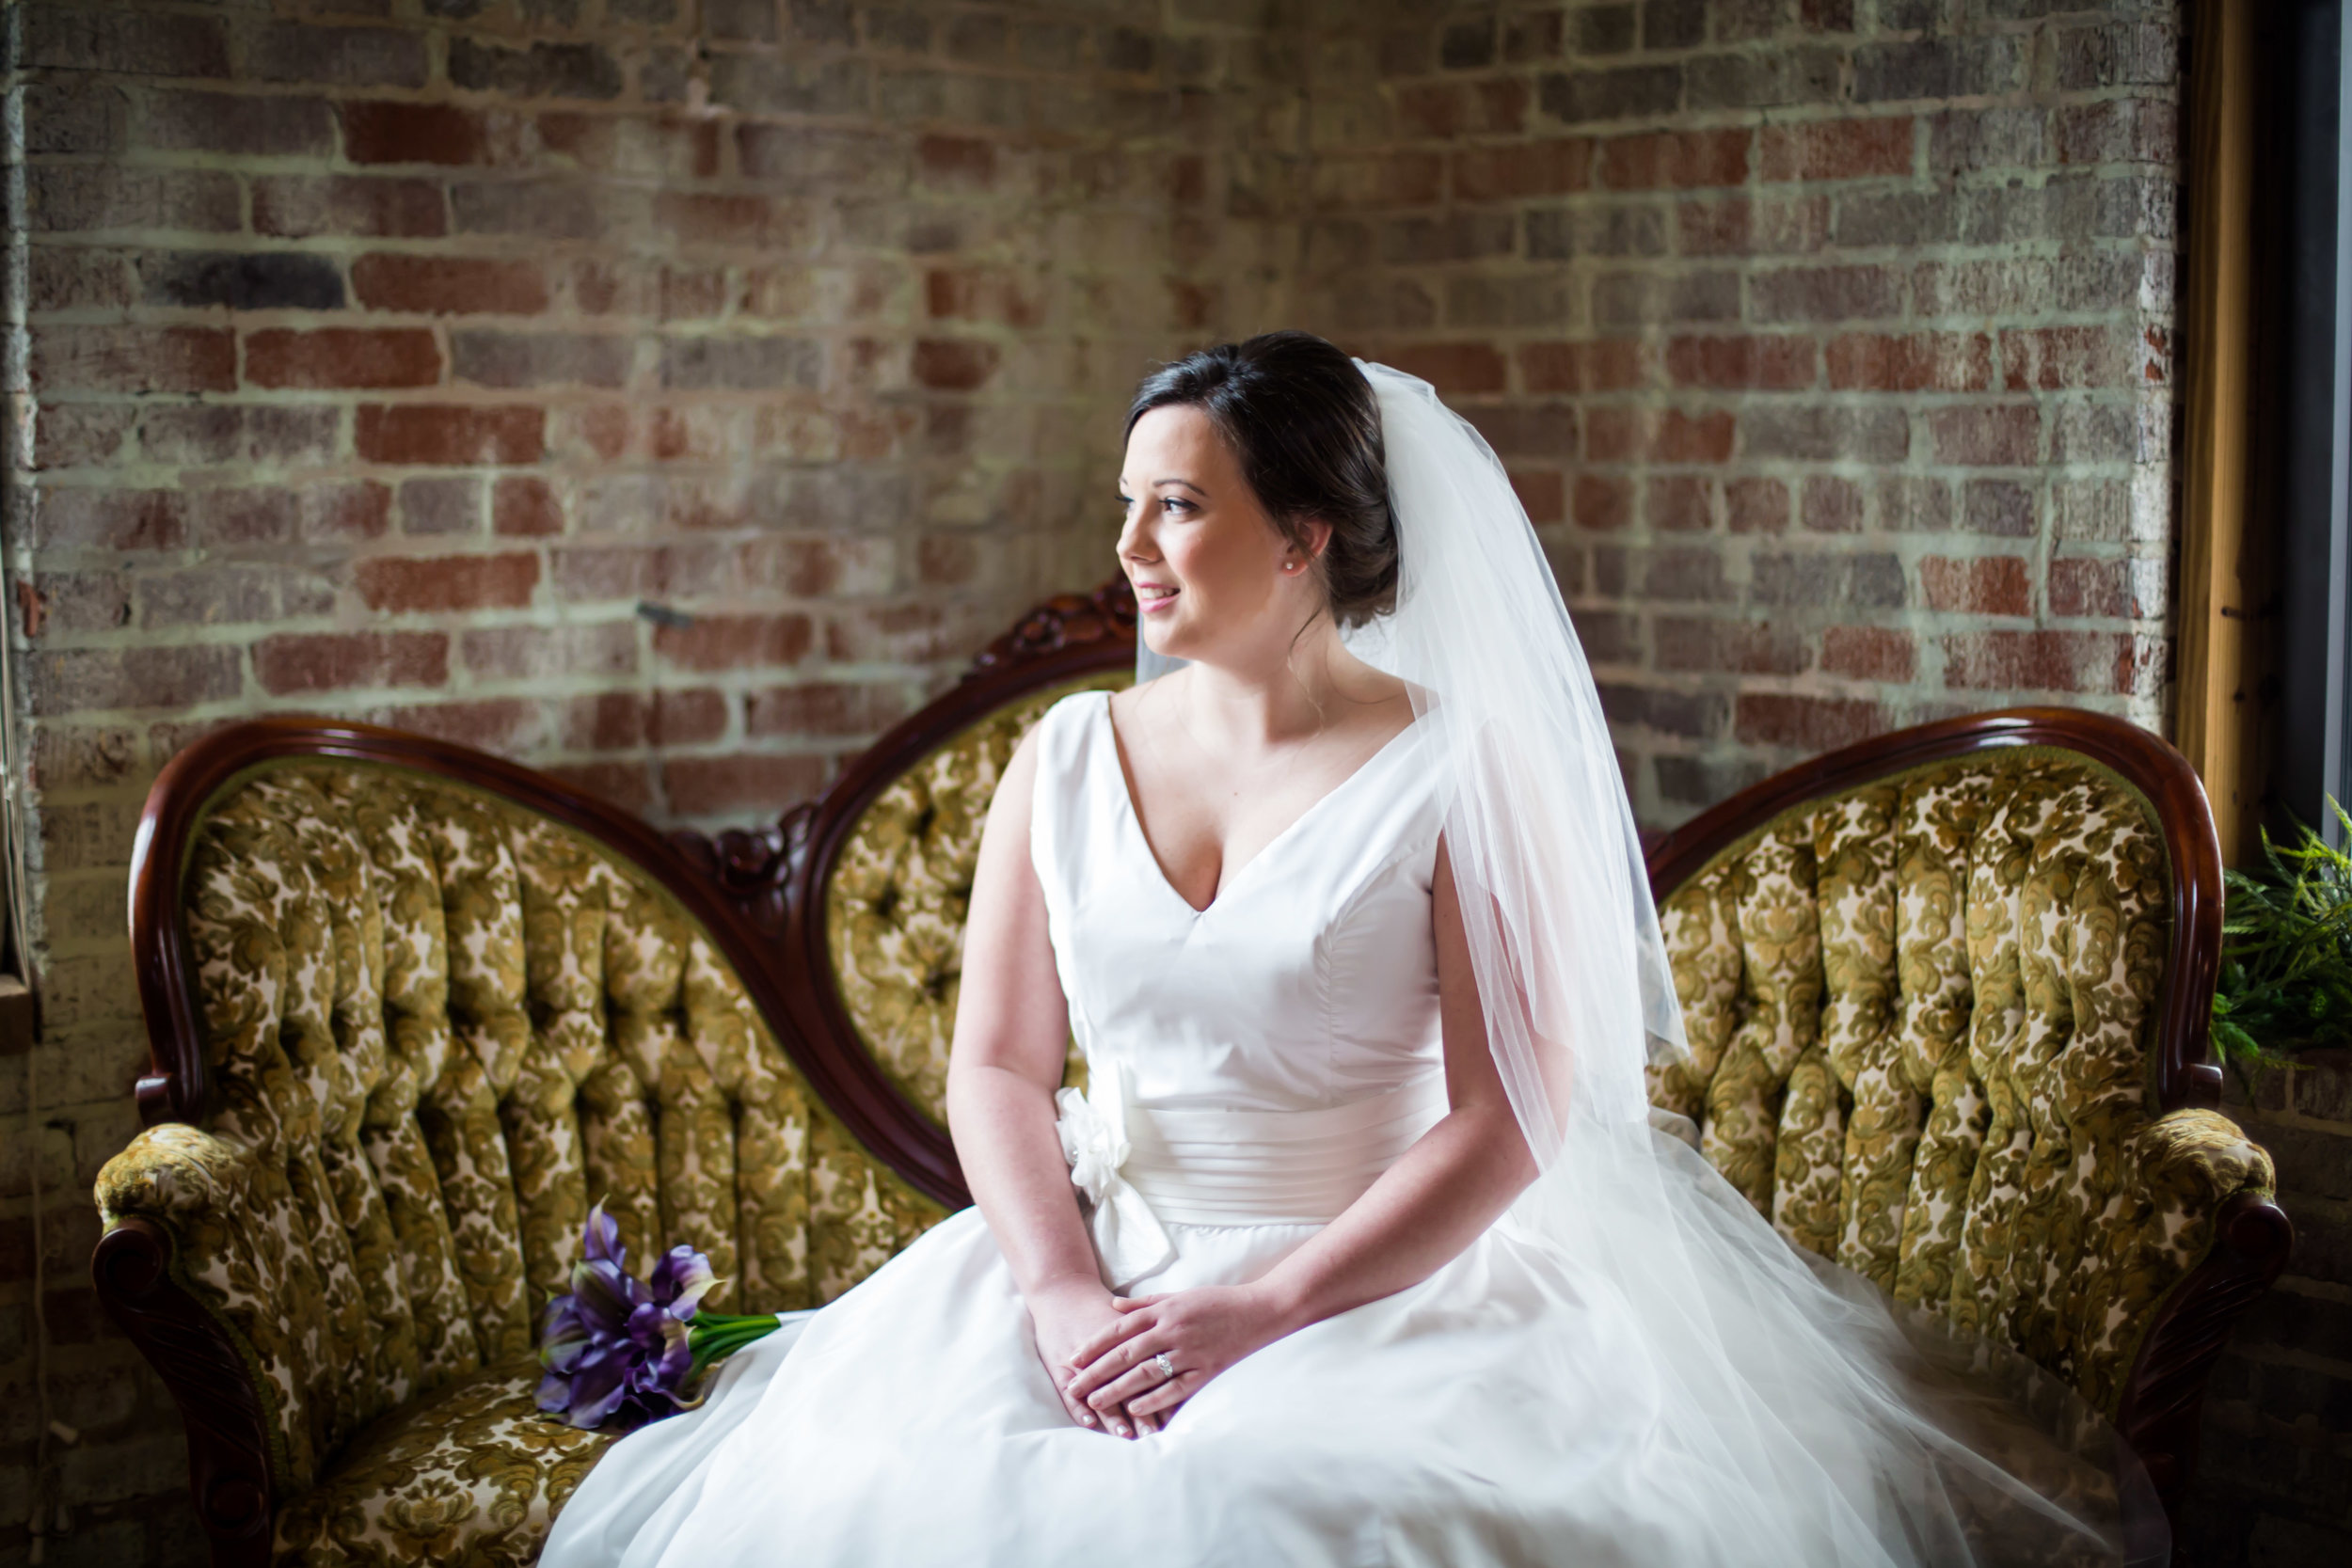 bridal (13 of 23).jpg